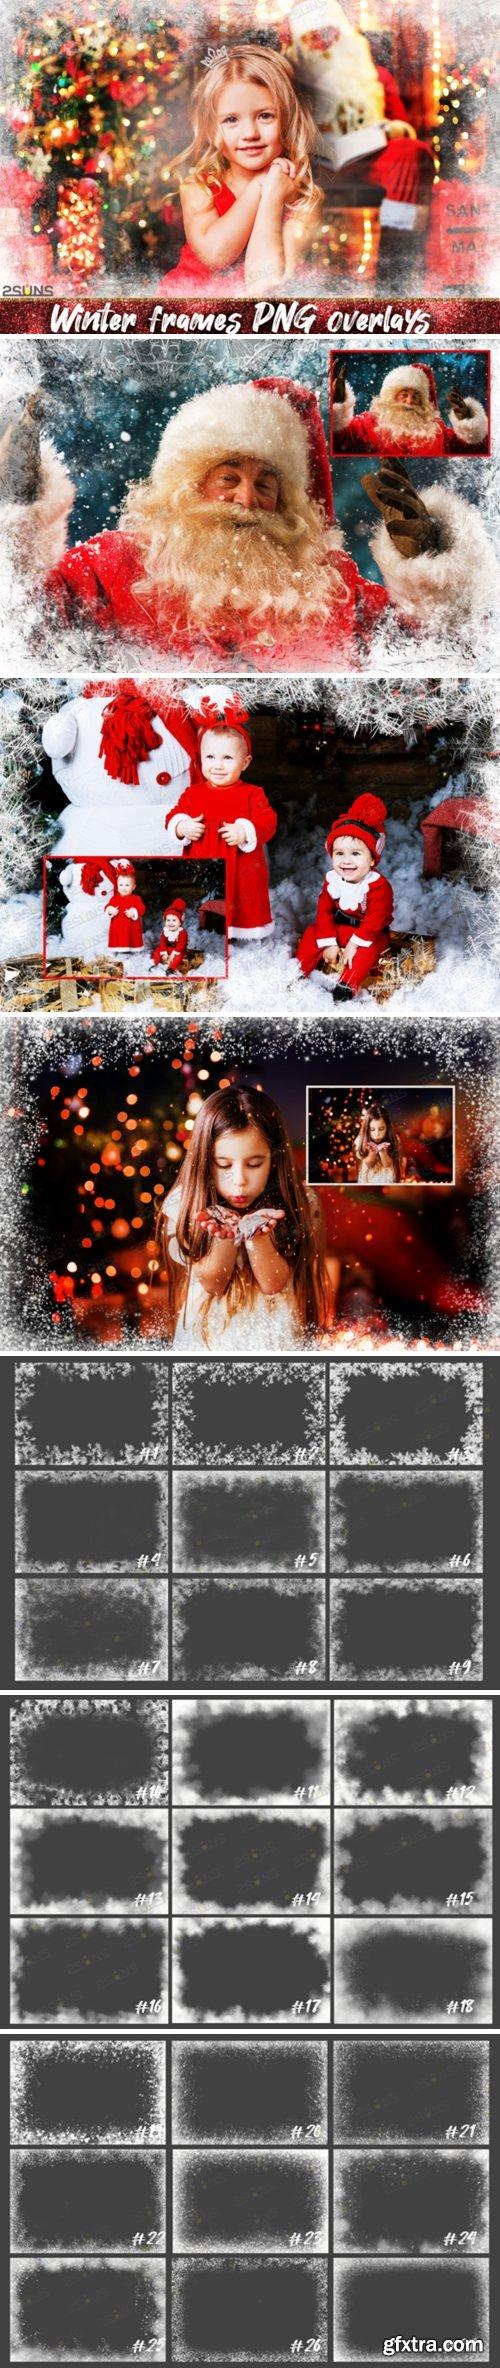 Photoshop Overlays Christmas Frames 2250943